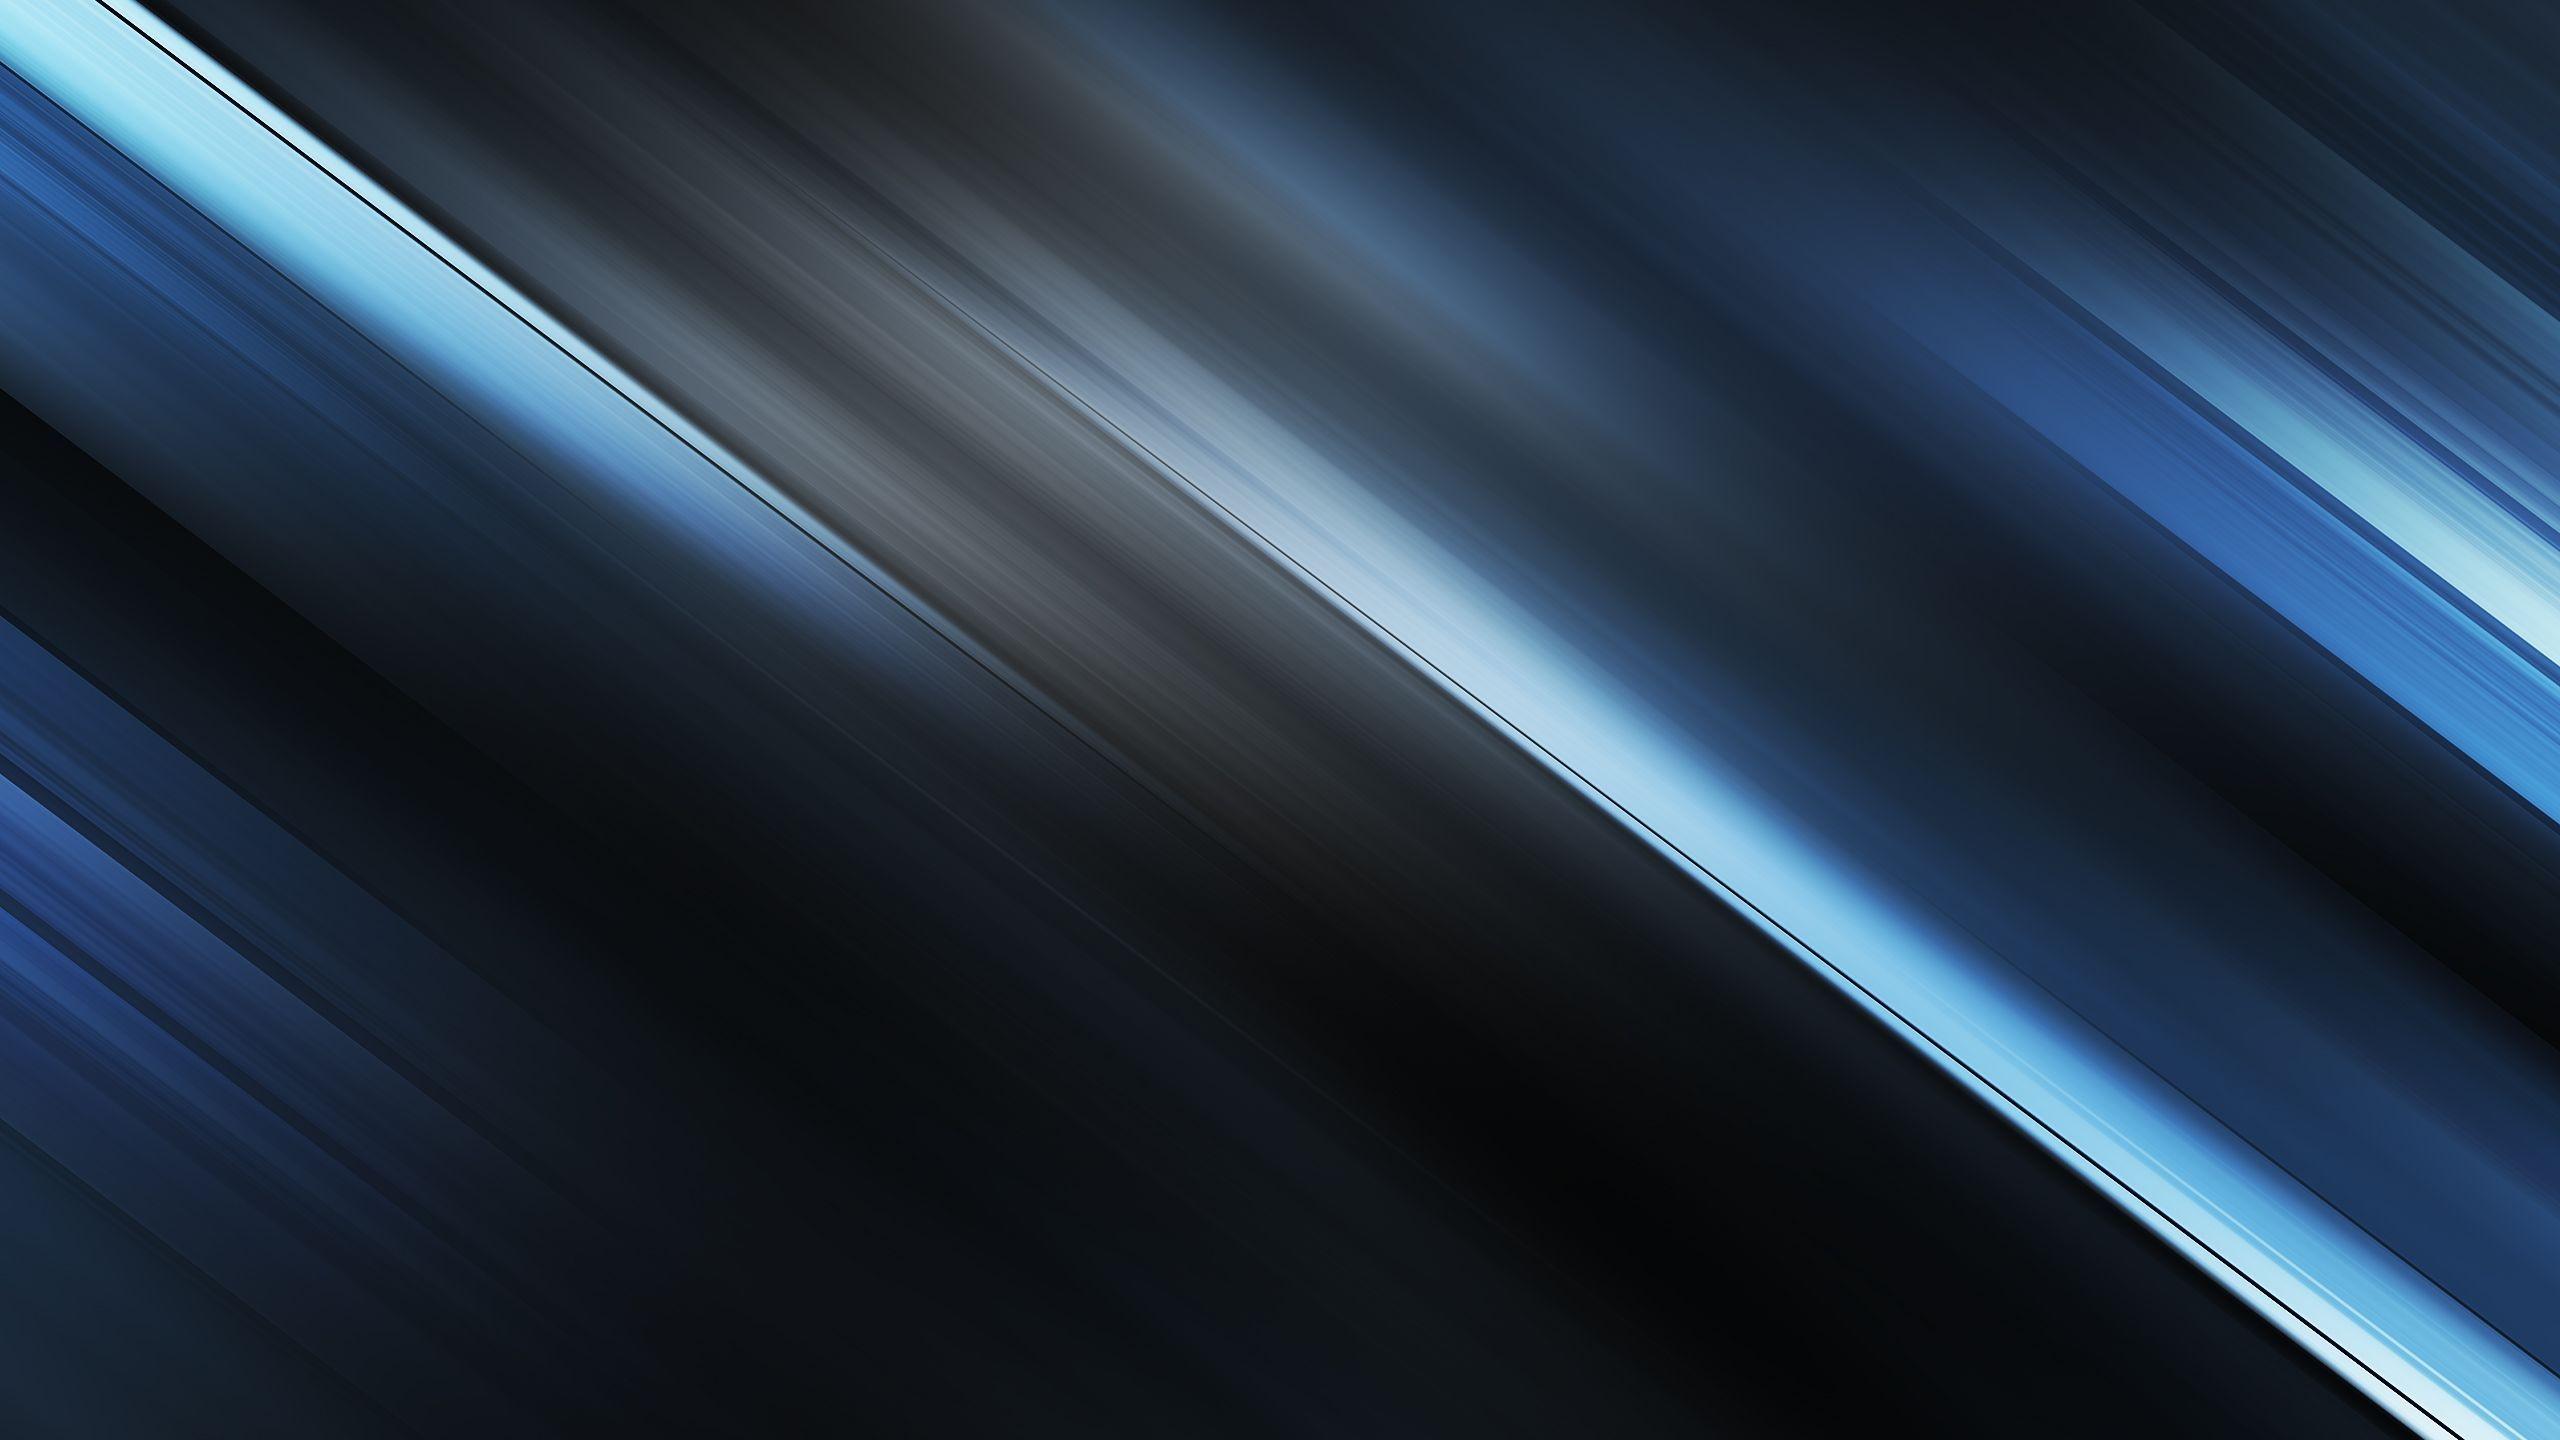 Gray Hd Wallpapers 1080P